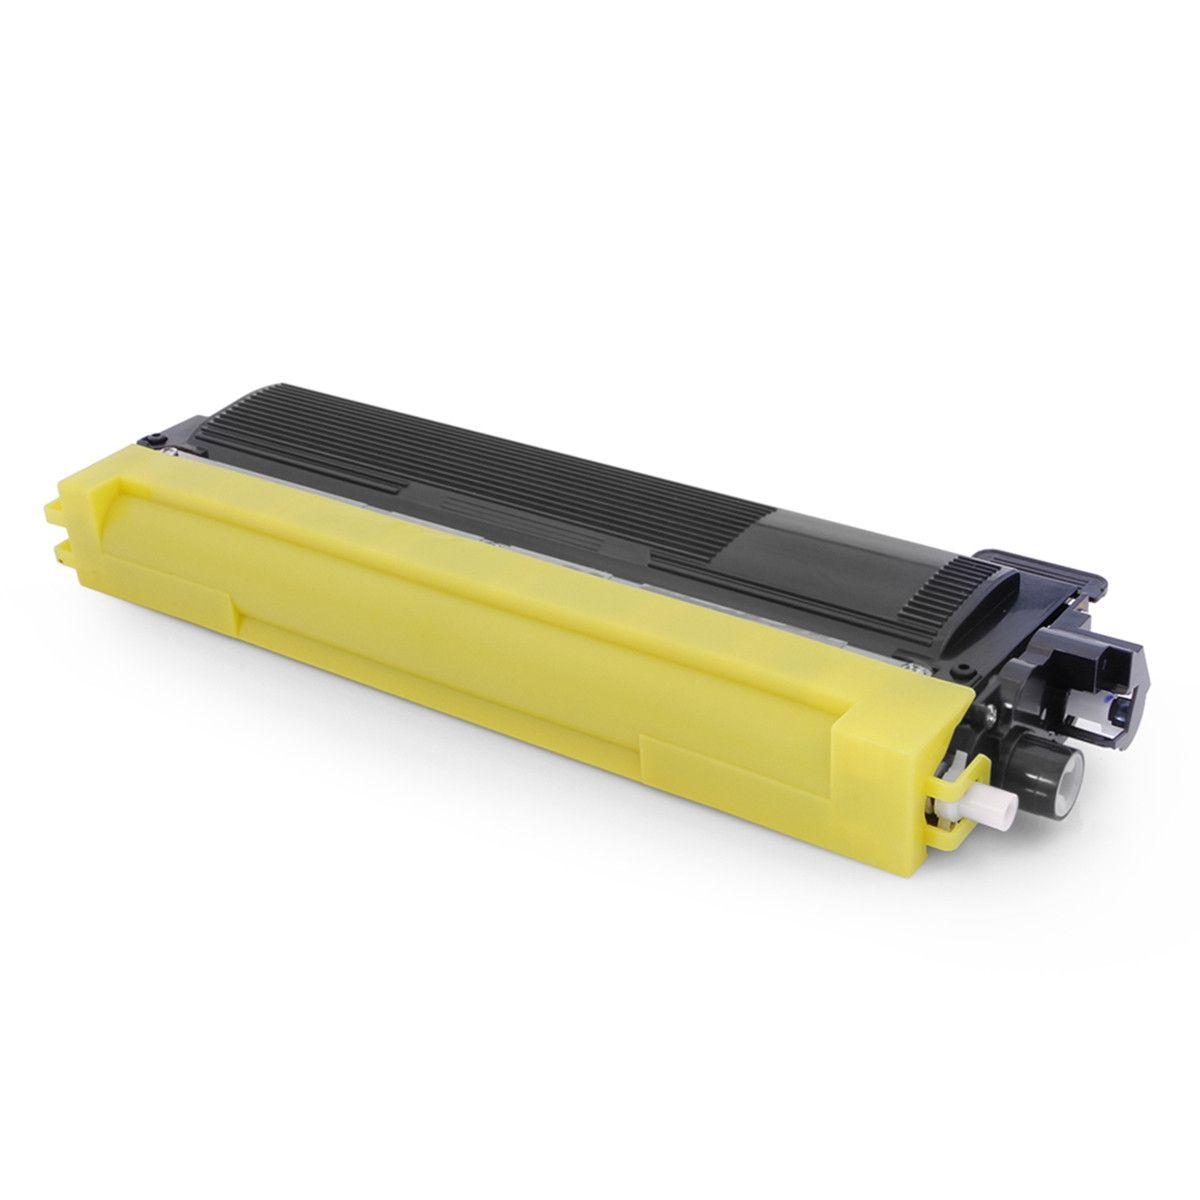 TONER COMPATÍVEL COM TONER BROTHER [TN210Y TN210] HL3040CN MFC9010CN MFC9320CW Yellow 1.400 Páginas - Cartucho & Cia